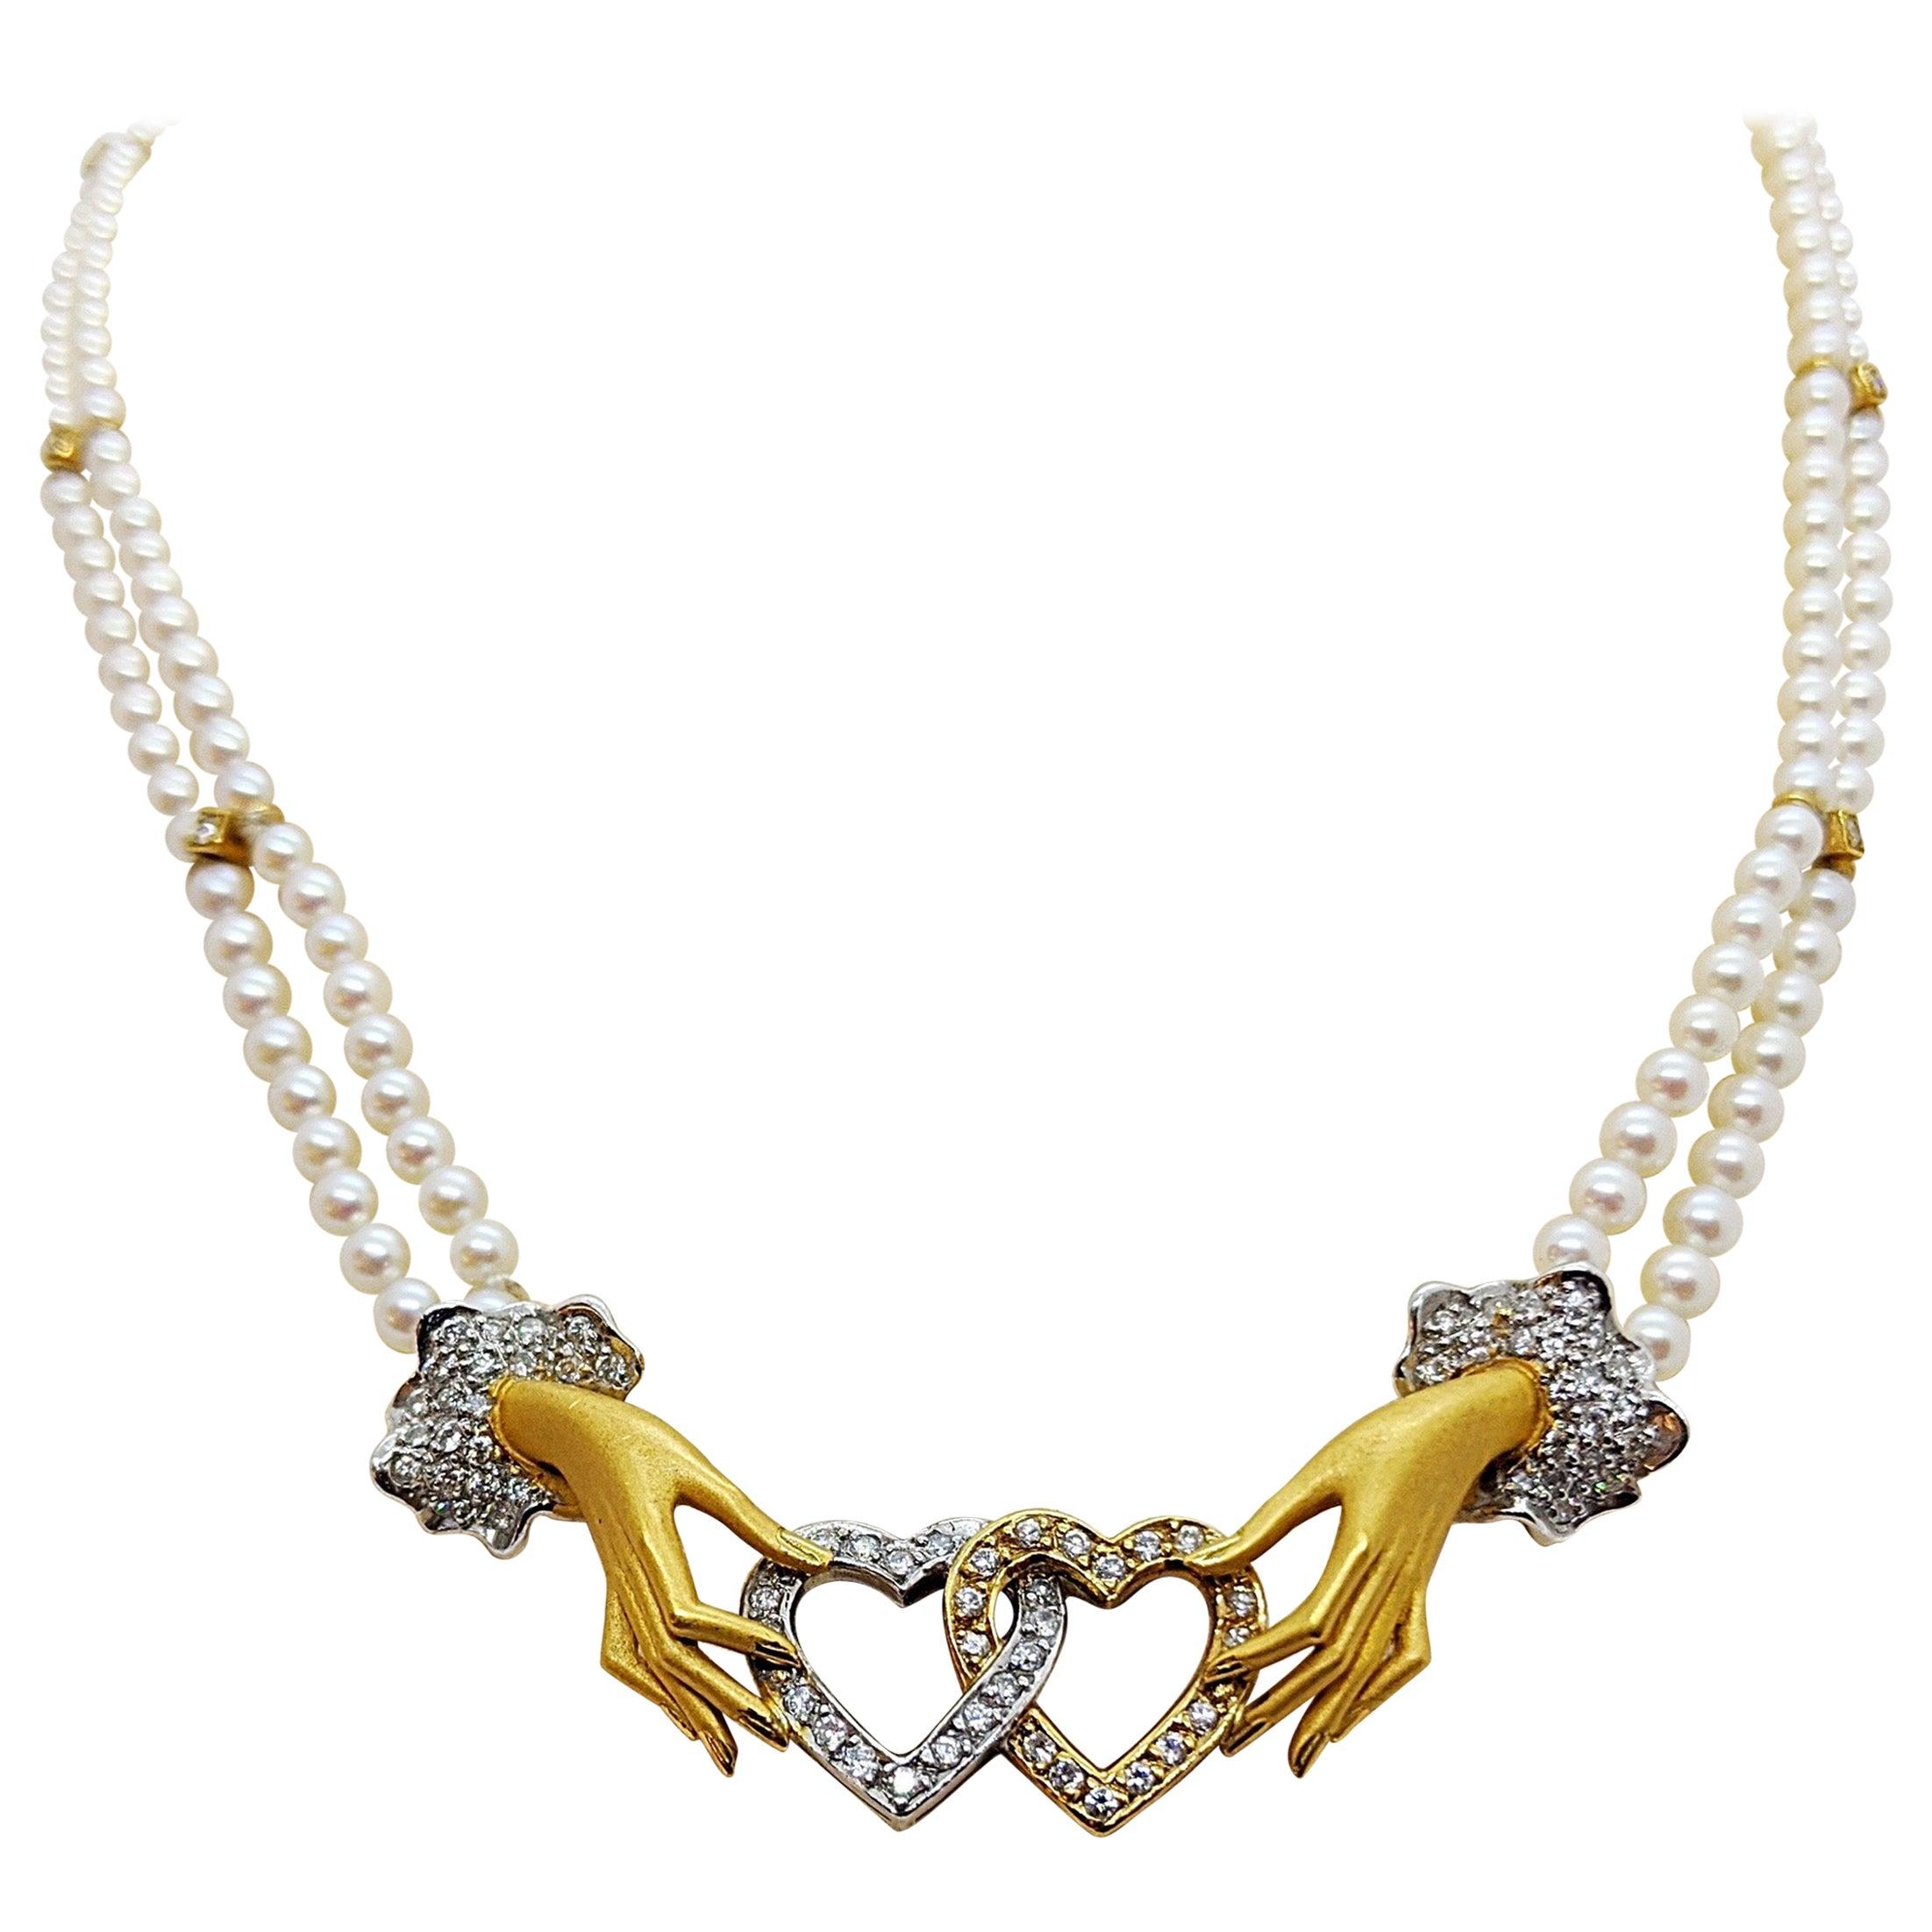 Carrera Y Carrera 18 Karat Yellow Gold and Pearl Necklace in Original Hand Motif